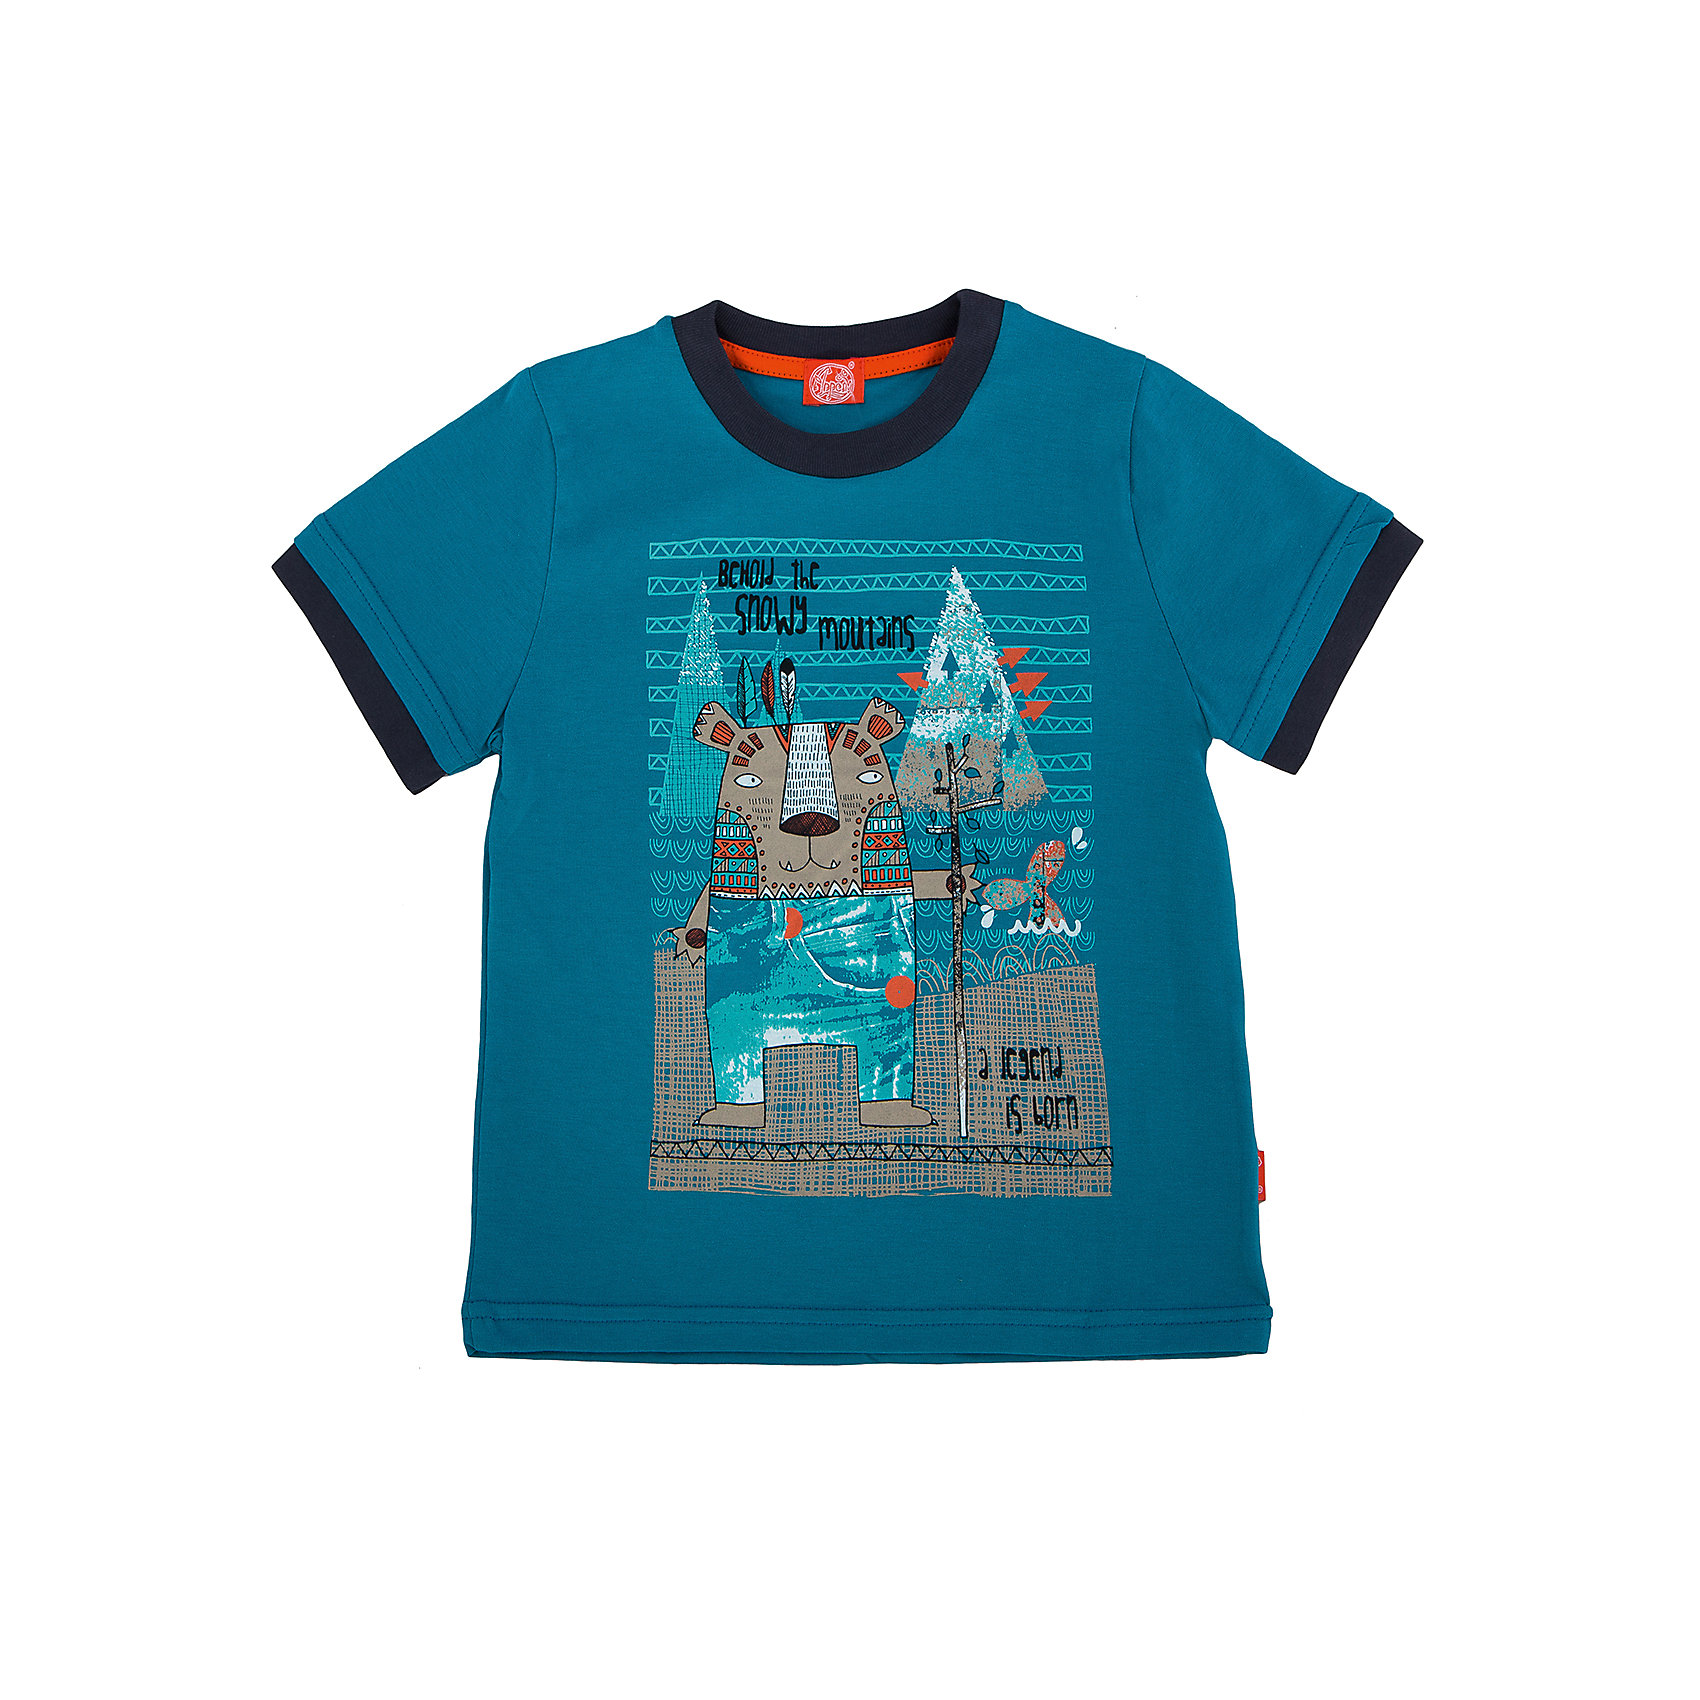 Апрель Футболка для мальчика Апрель апрель футболка для мальчика апрель